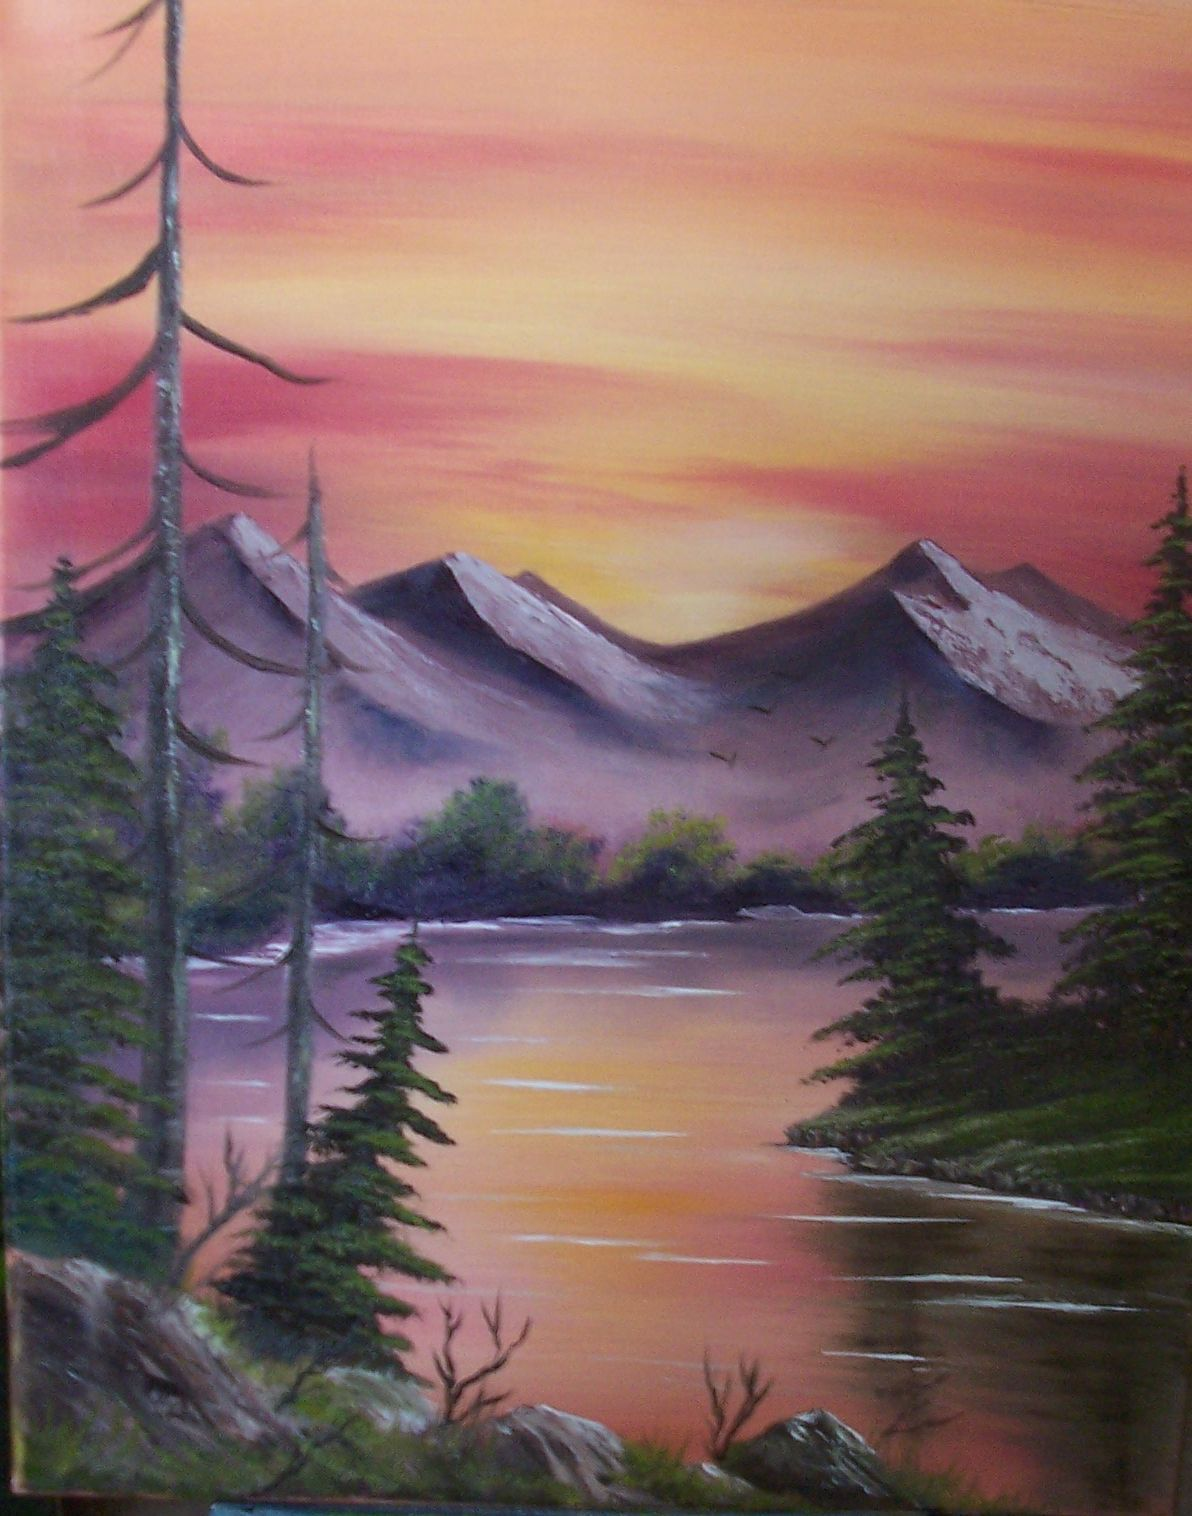 Sunset Mountain Paintings For Sale Classes Www Paintwithvicki Com Landscapedrawing Landscape Drawings Landscape Paintings Seascape Paintings